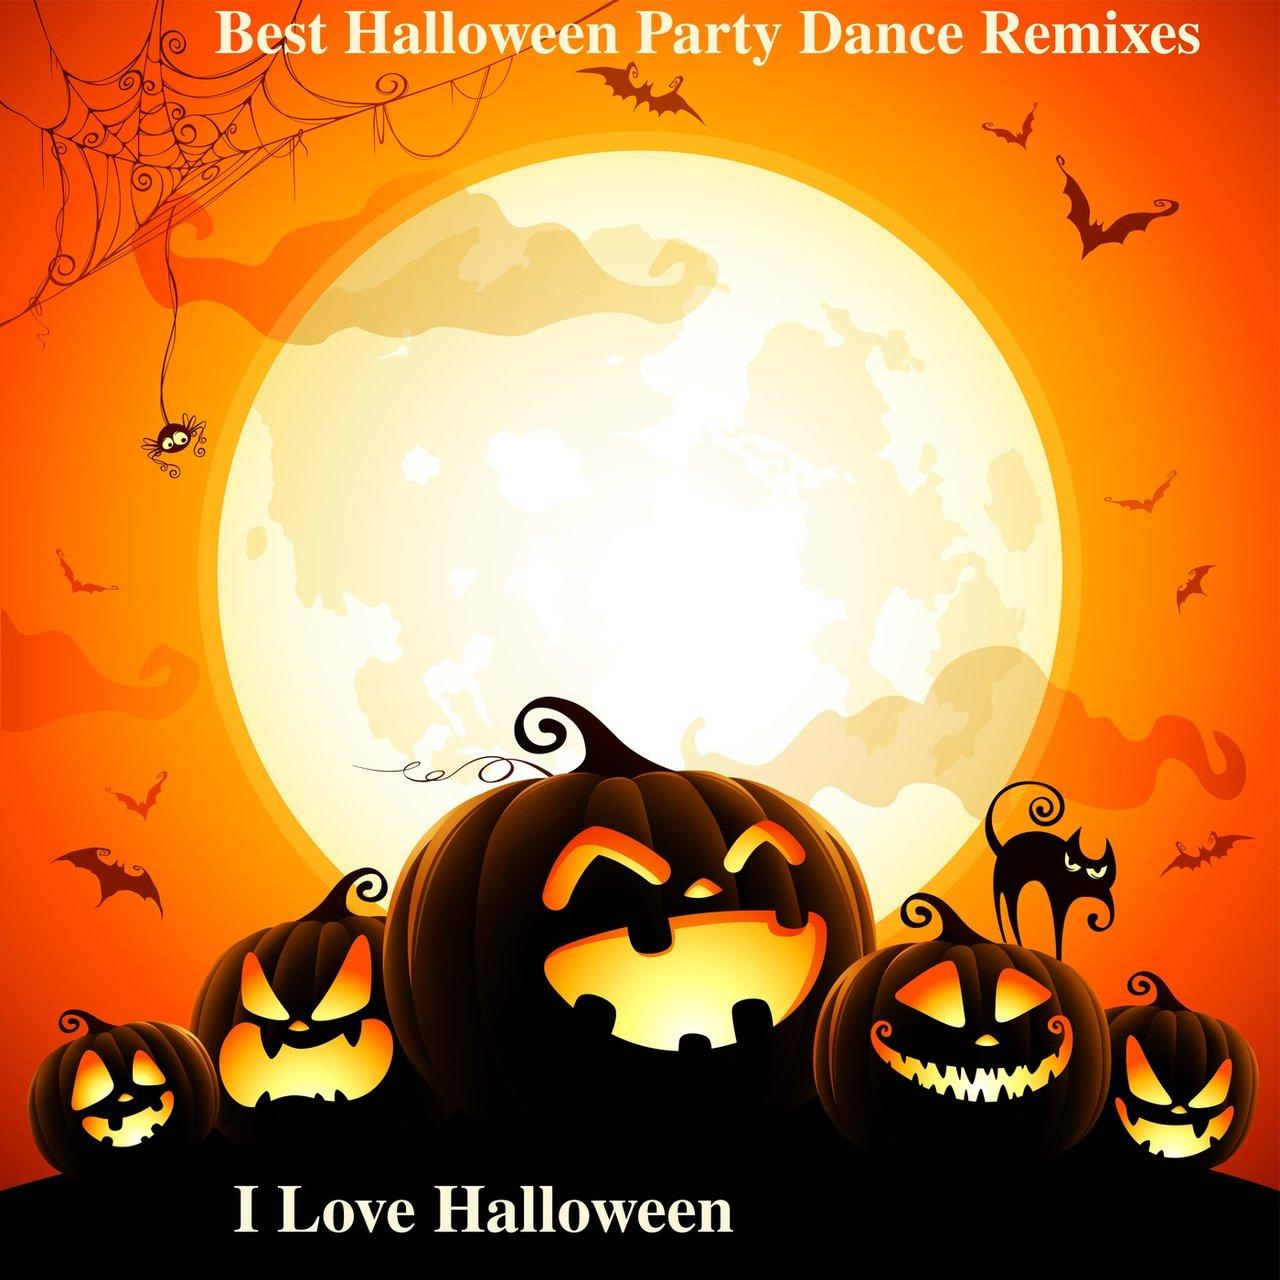 TIDAL: Listen to Best Halloween Party Dance Remixes on TIDAL